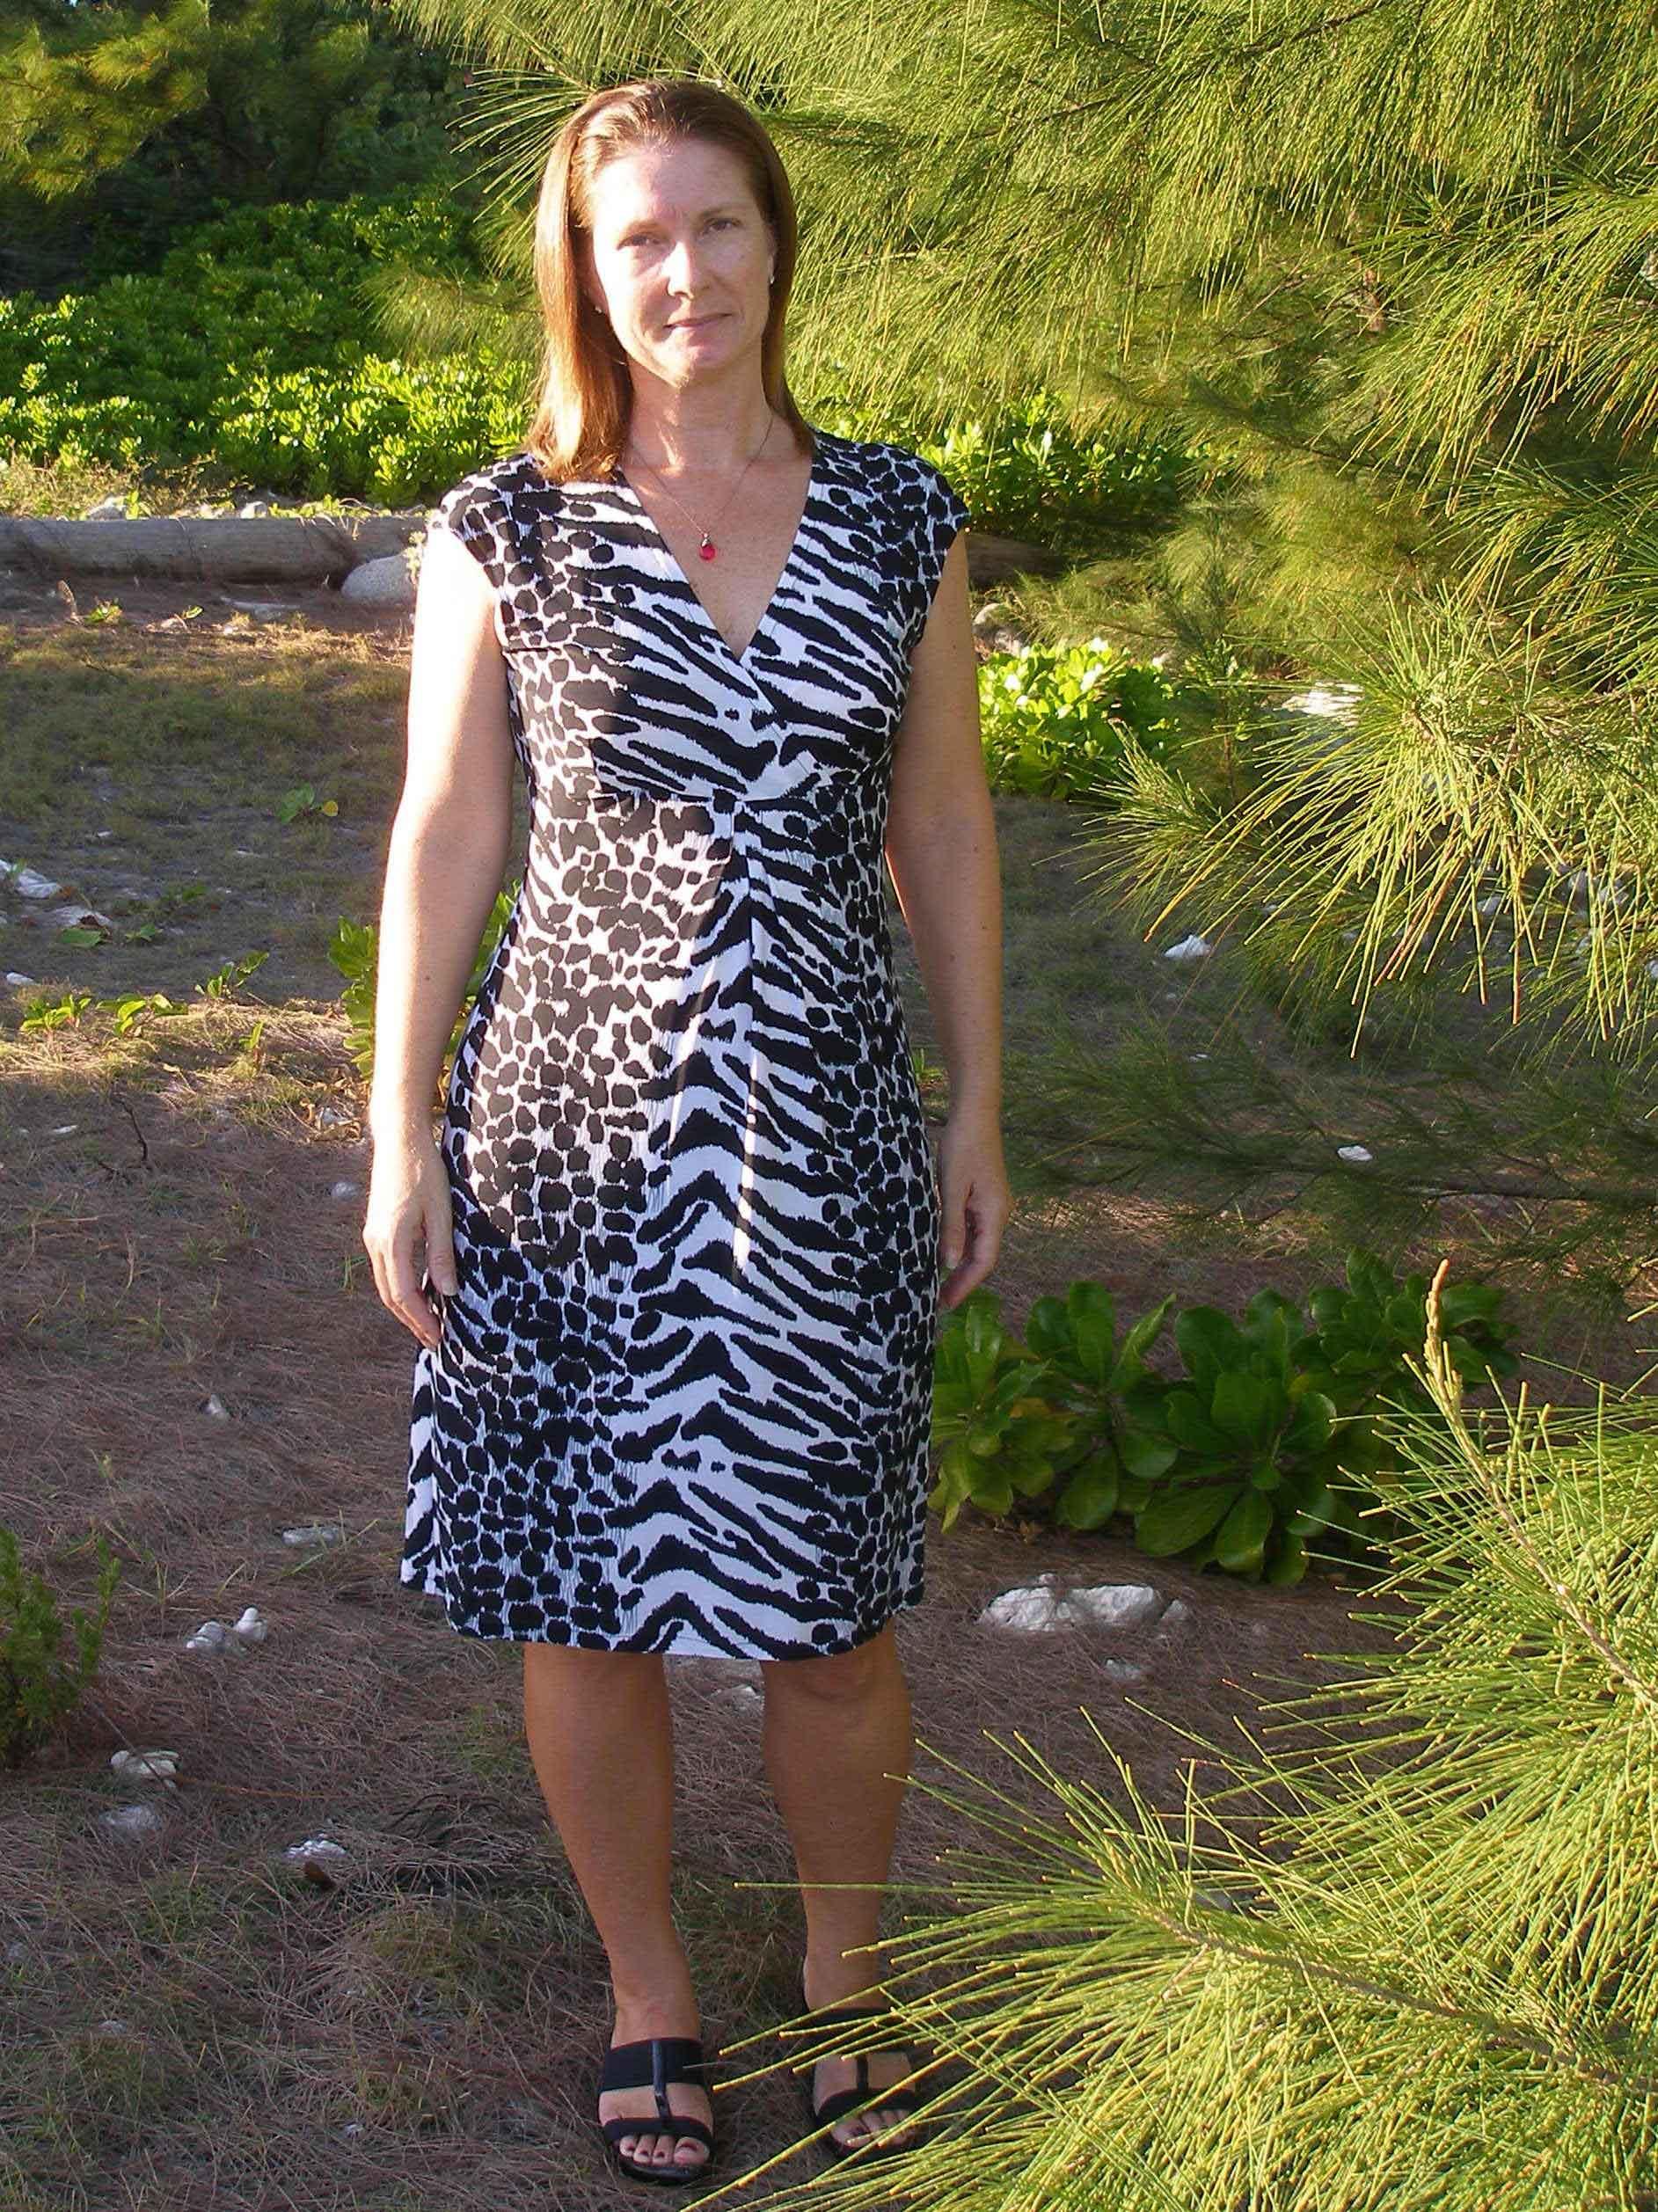 Vogue 8724 - animal print knit dress - So Sew Easy